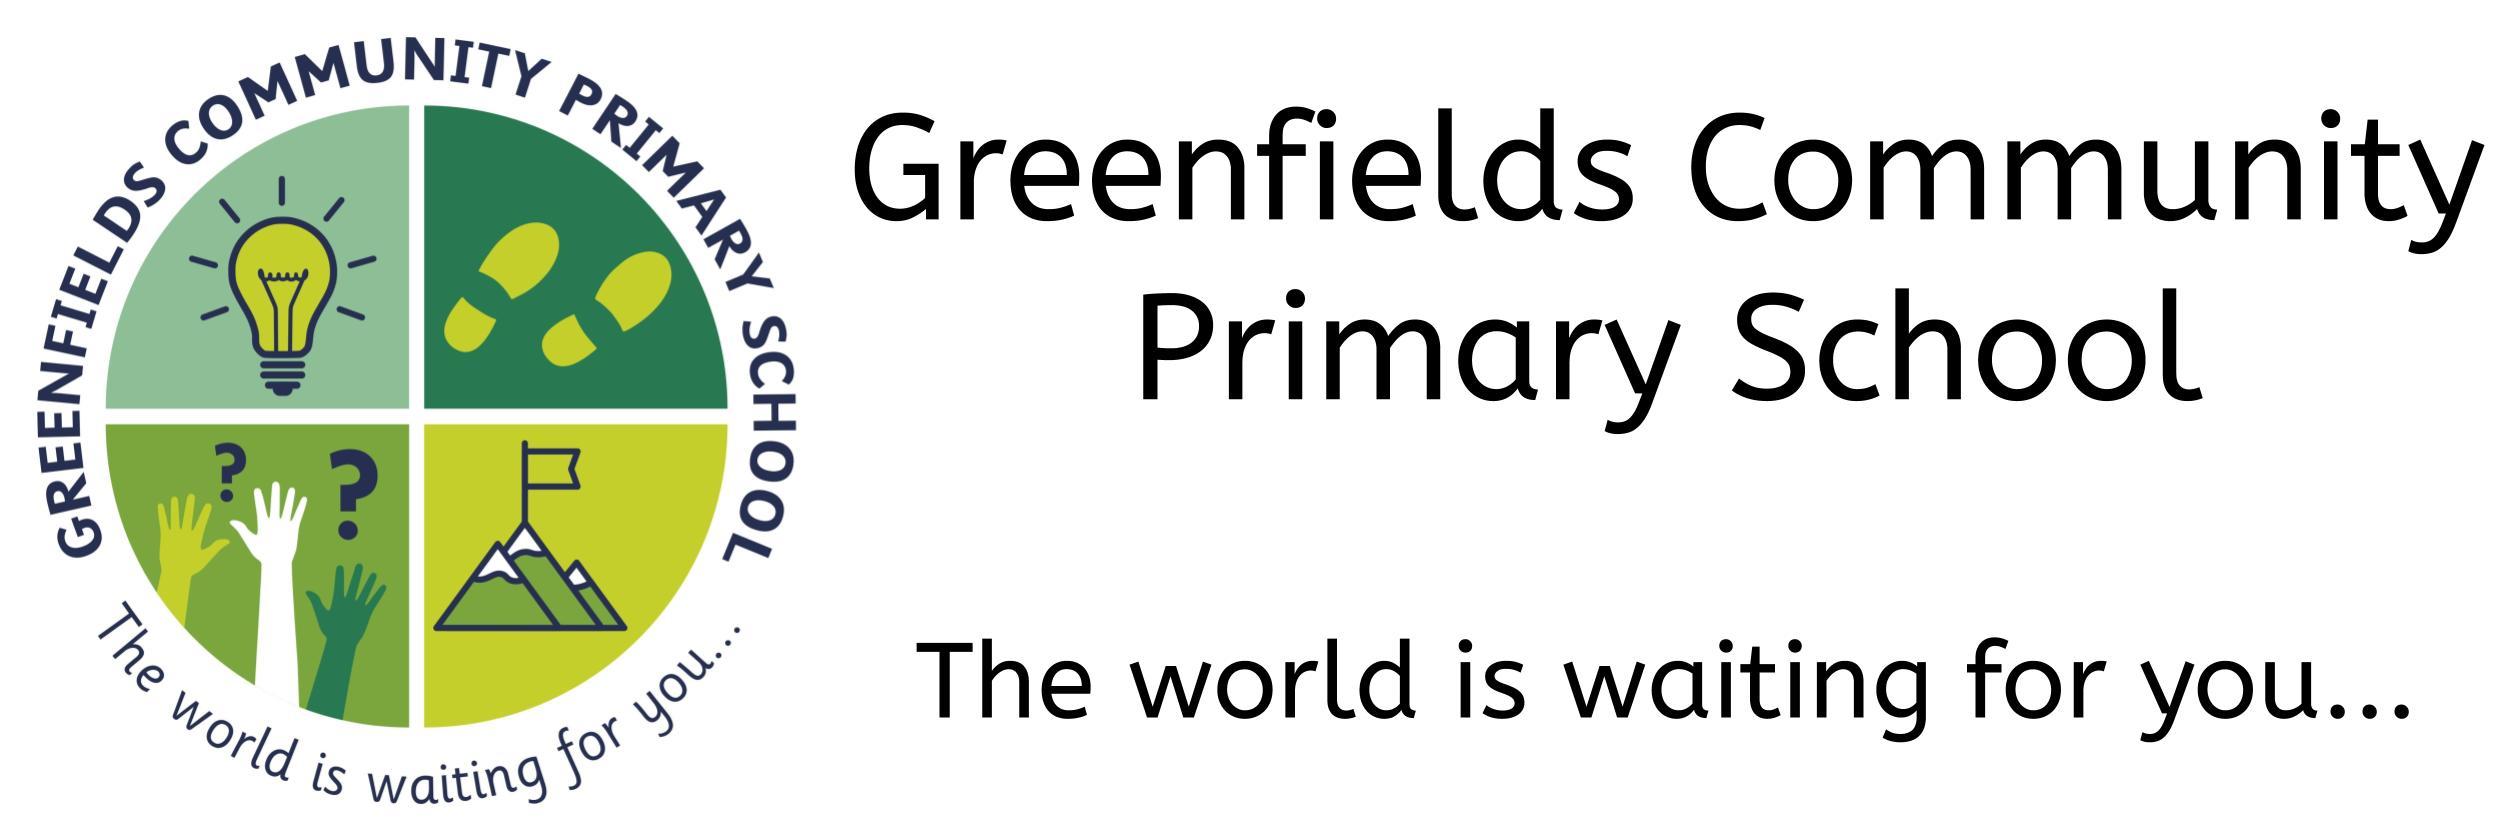 Greenfields Community Primary School